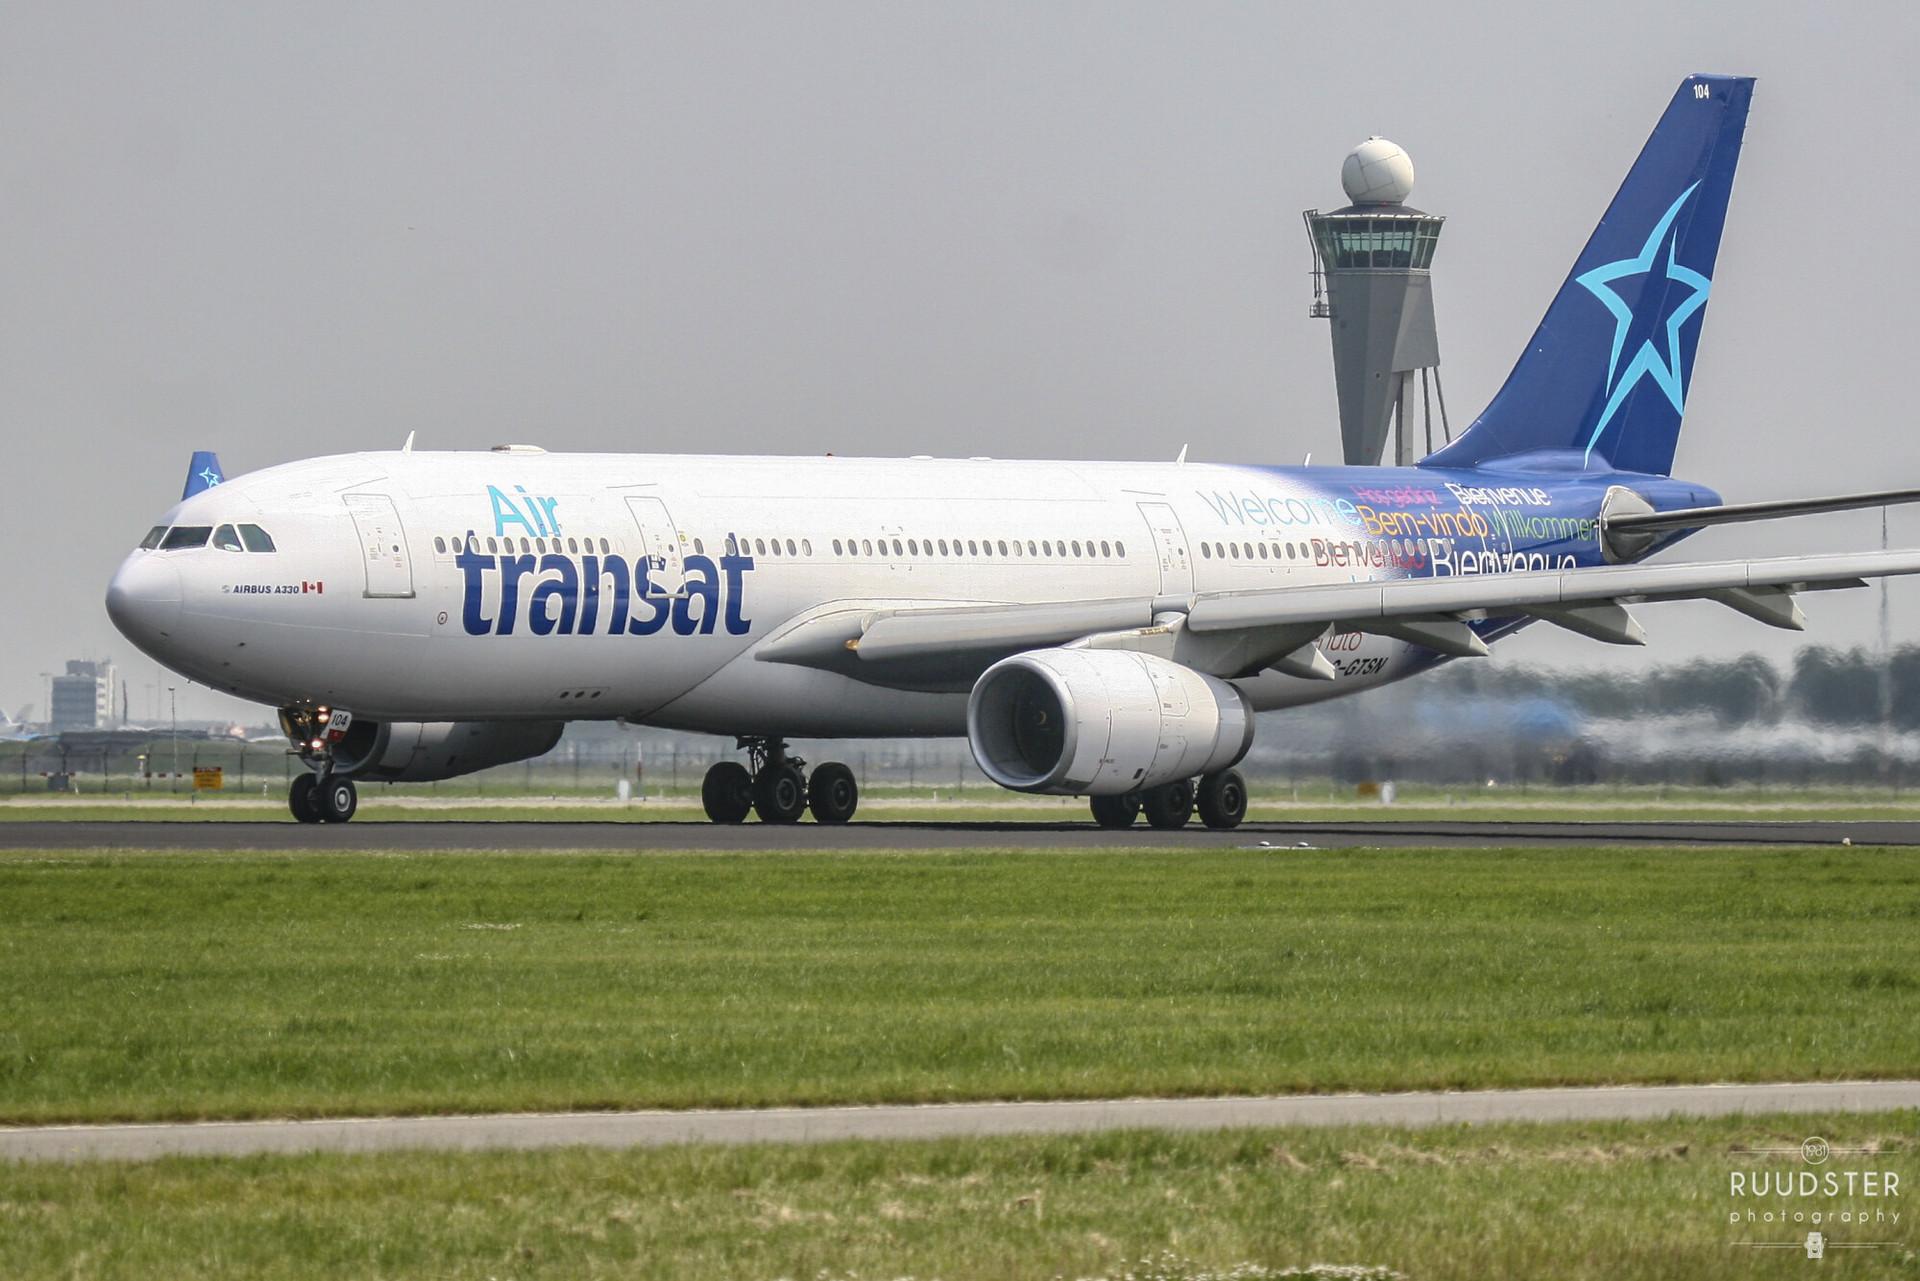 C-GTSN | Build: 2000 - Airbus A330-243